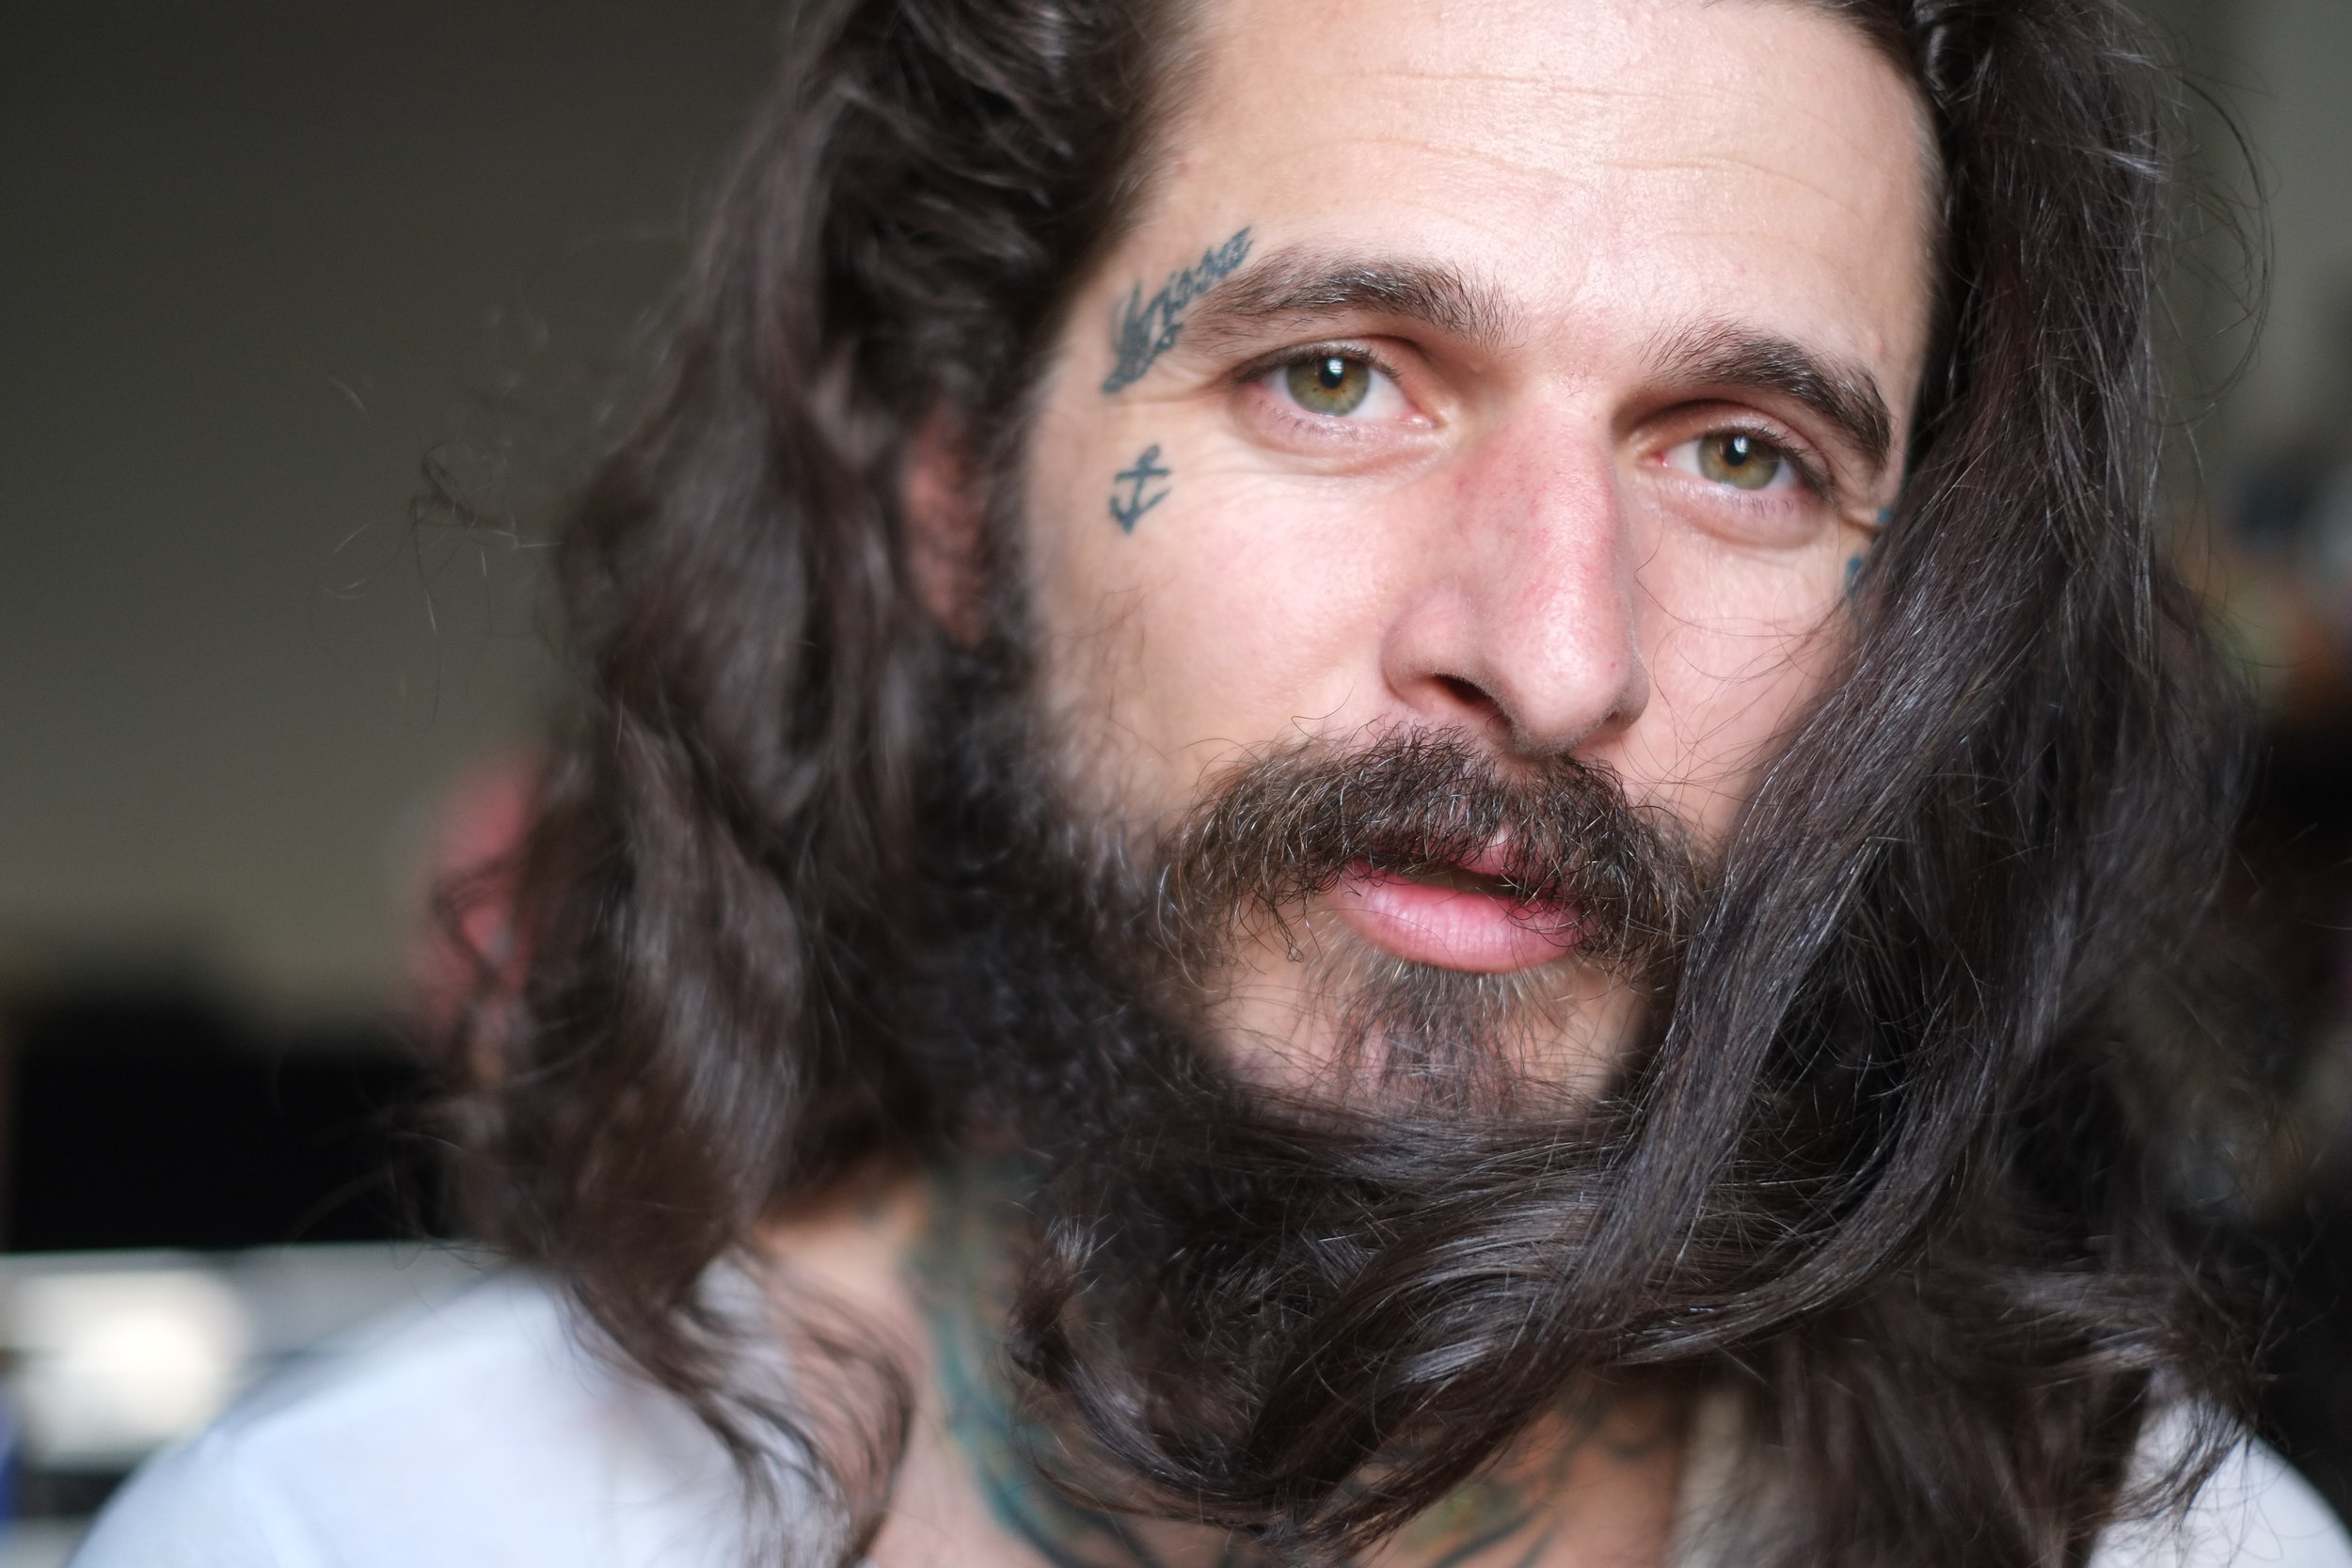 Zandor Burai viii: Artiste/humanoid